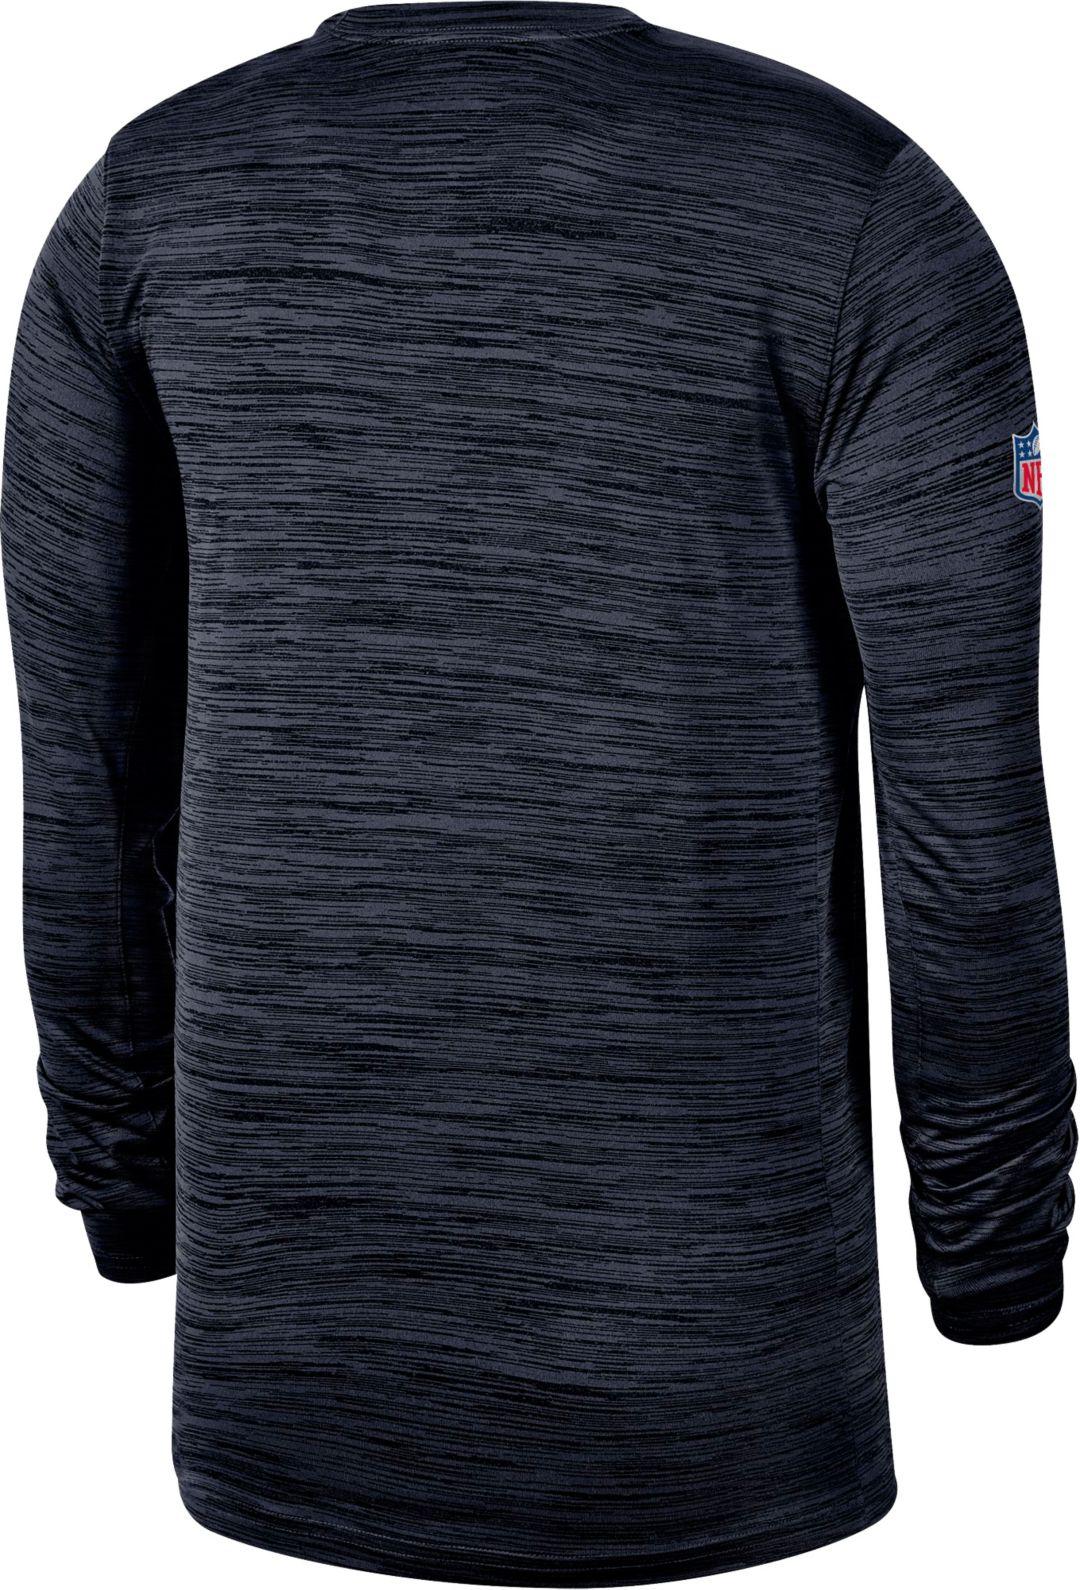 sale retailer 80ffe 3e159 Nike Youth Dallas Cowboys Sideline Legend Velocity Navy Long ...